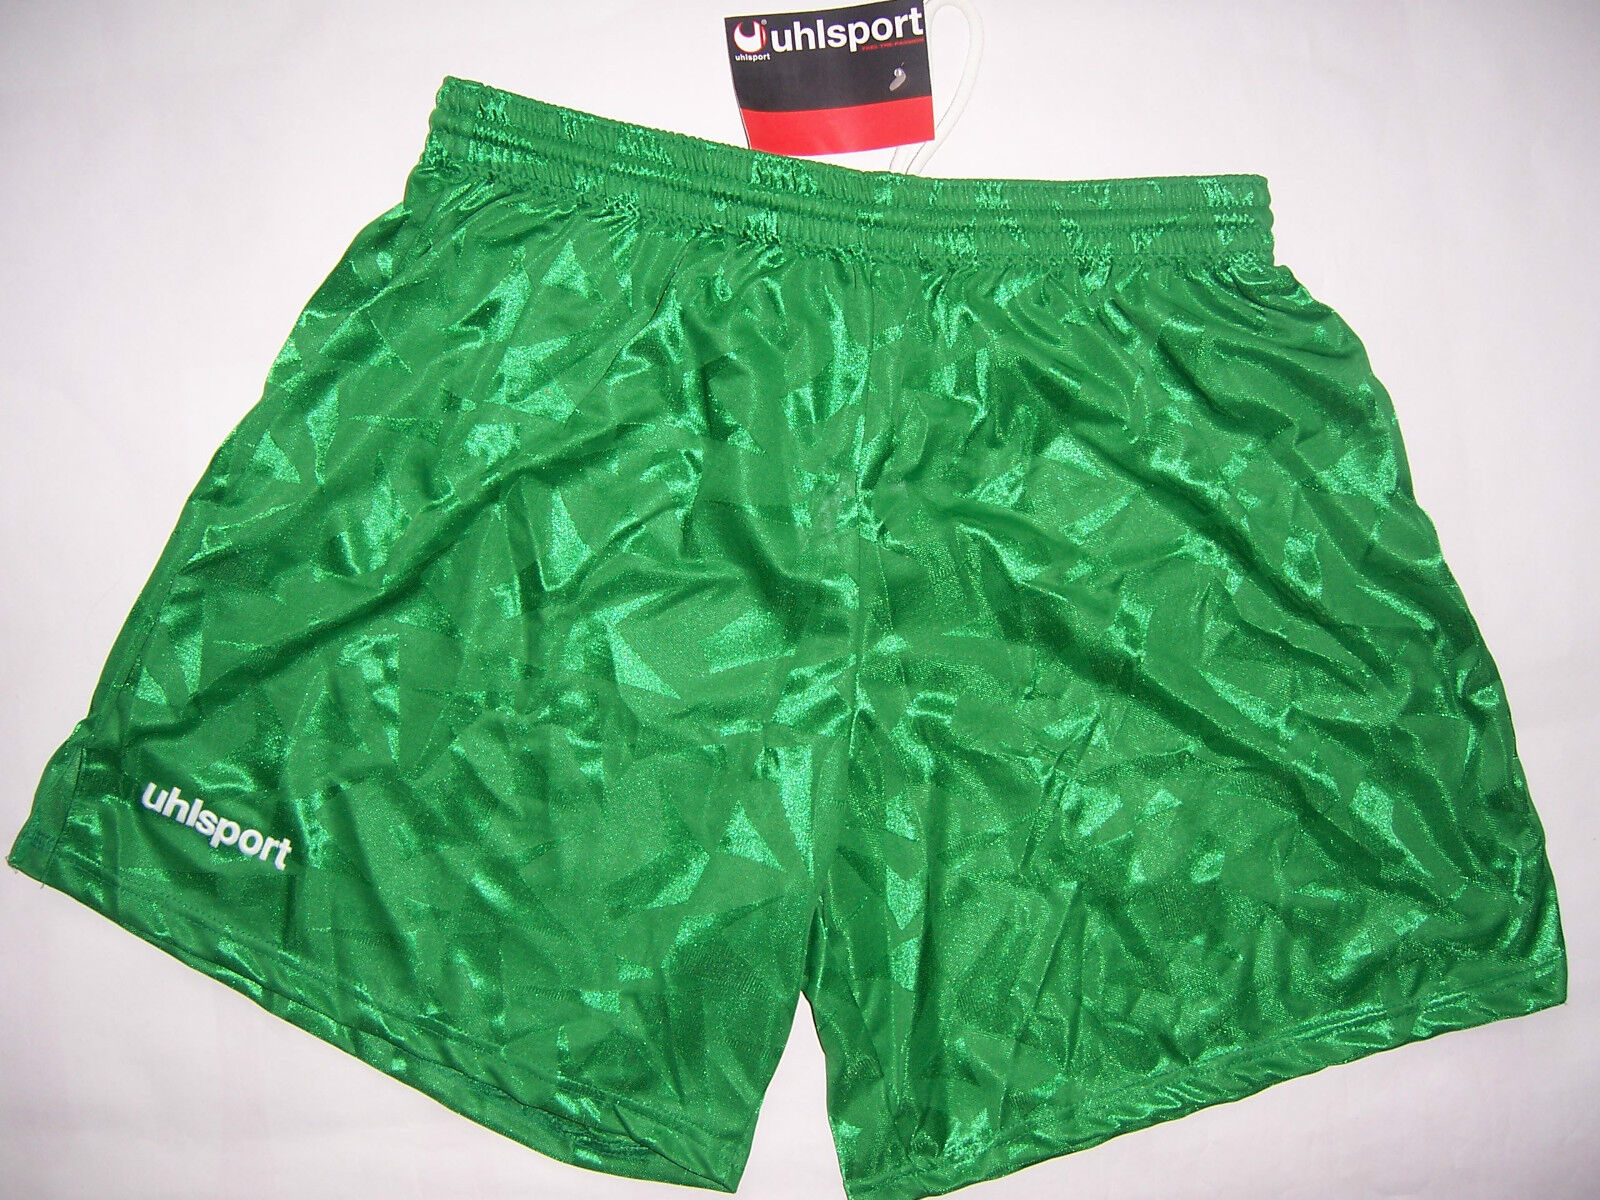 SHORT Football VINTAGE Uhlsport neuf années 90'S coloris vert vert vert taille XL  protección post-venta